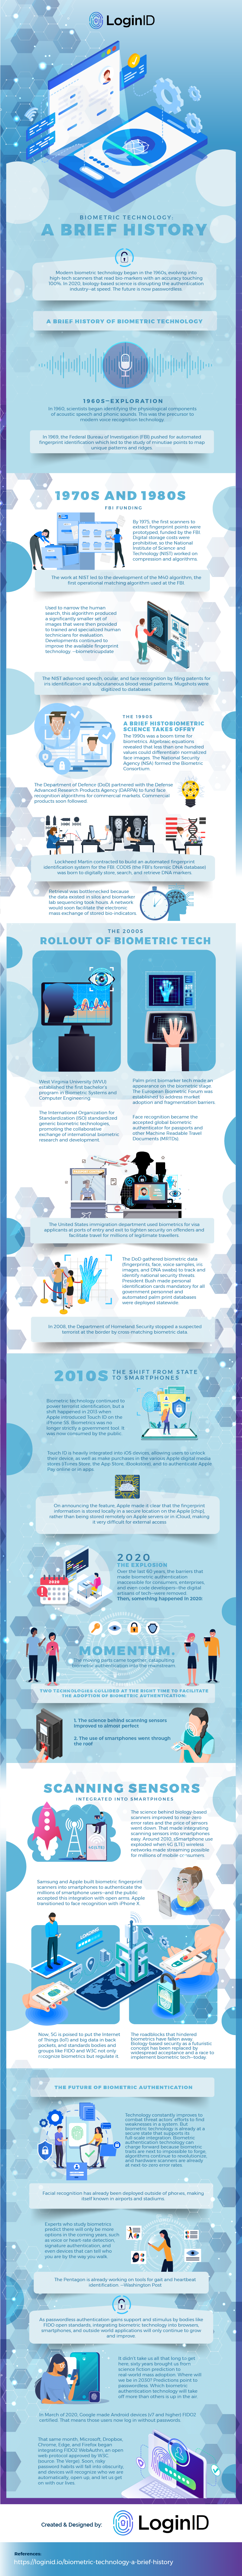 Biometric Technology a brief history- JIAIJA23DA